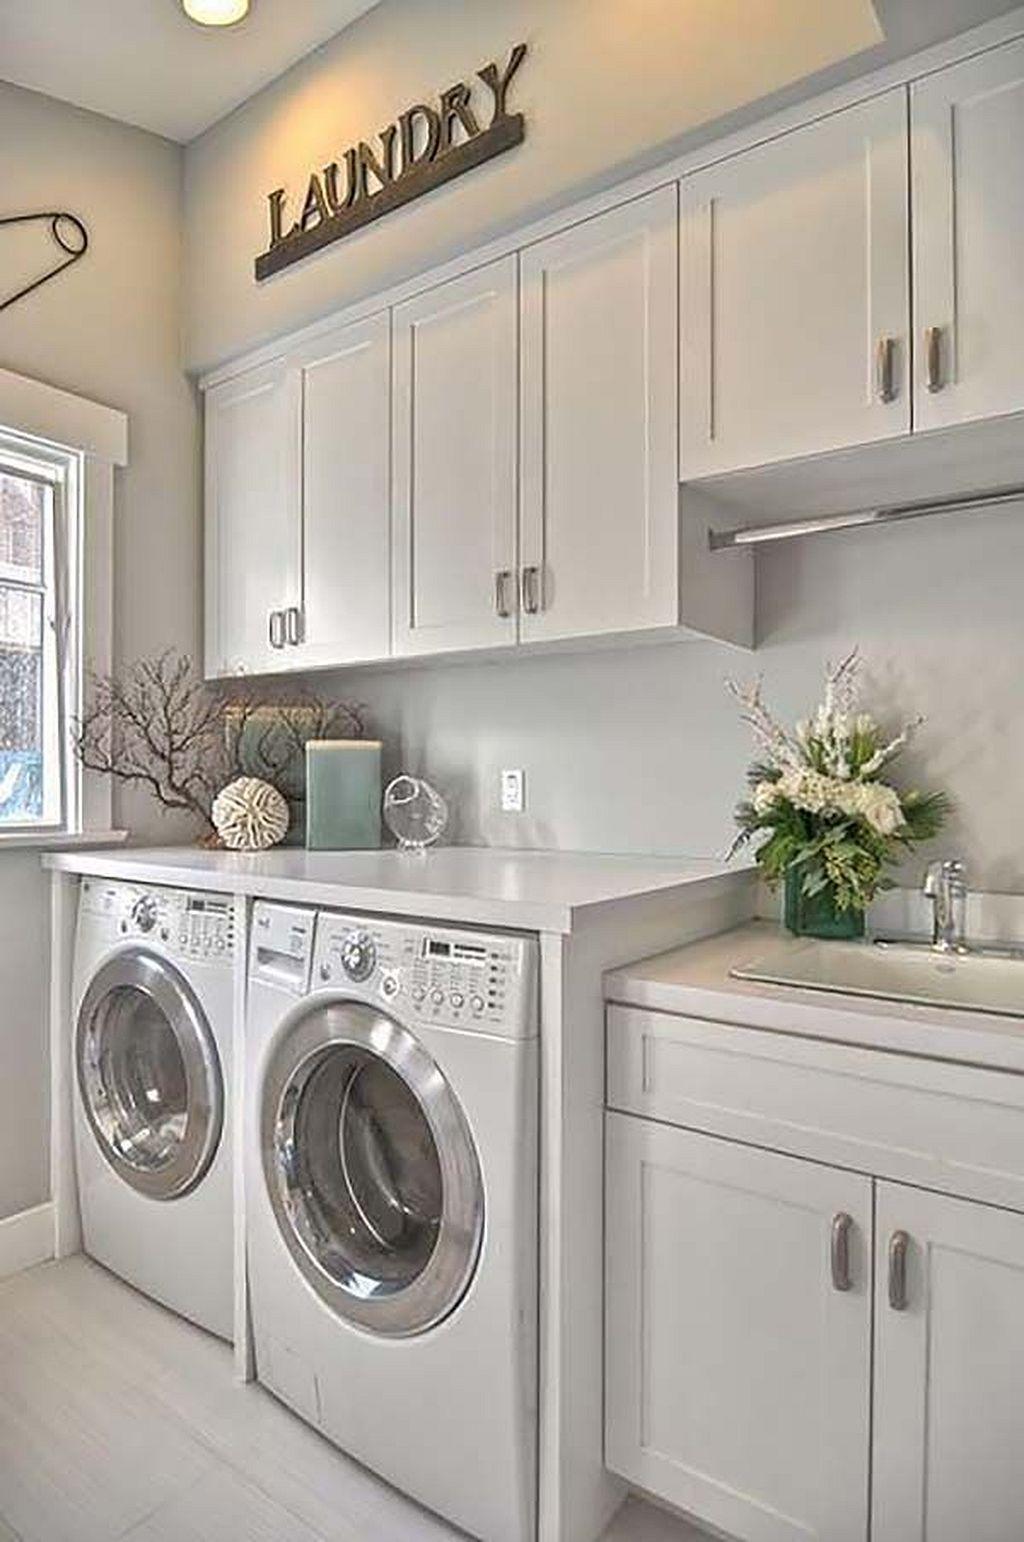 41 Amazing Laundry Room Ideas | Laundry room remodel ... on Amazing Laundry Rooms  id=26947